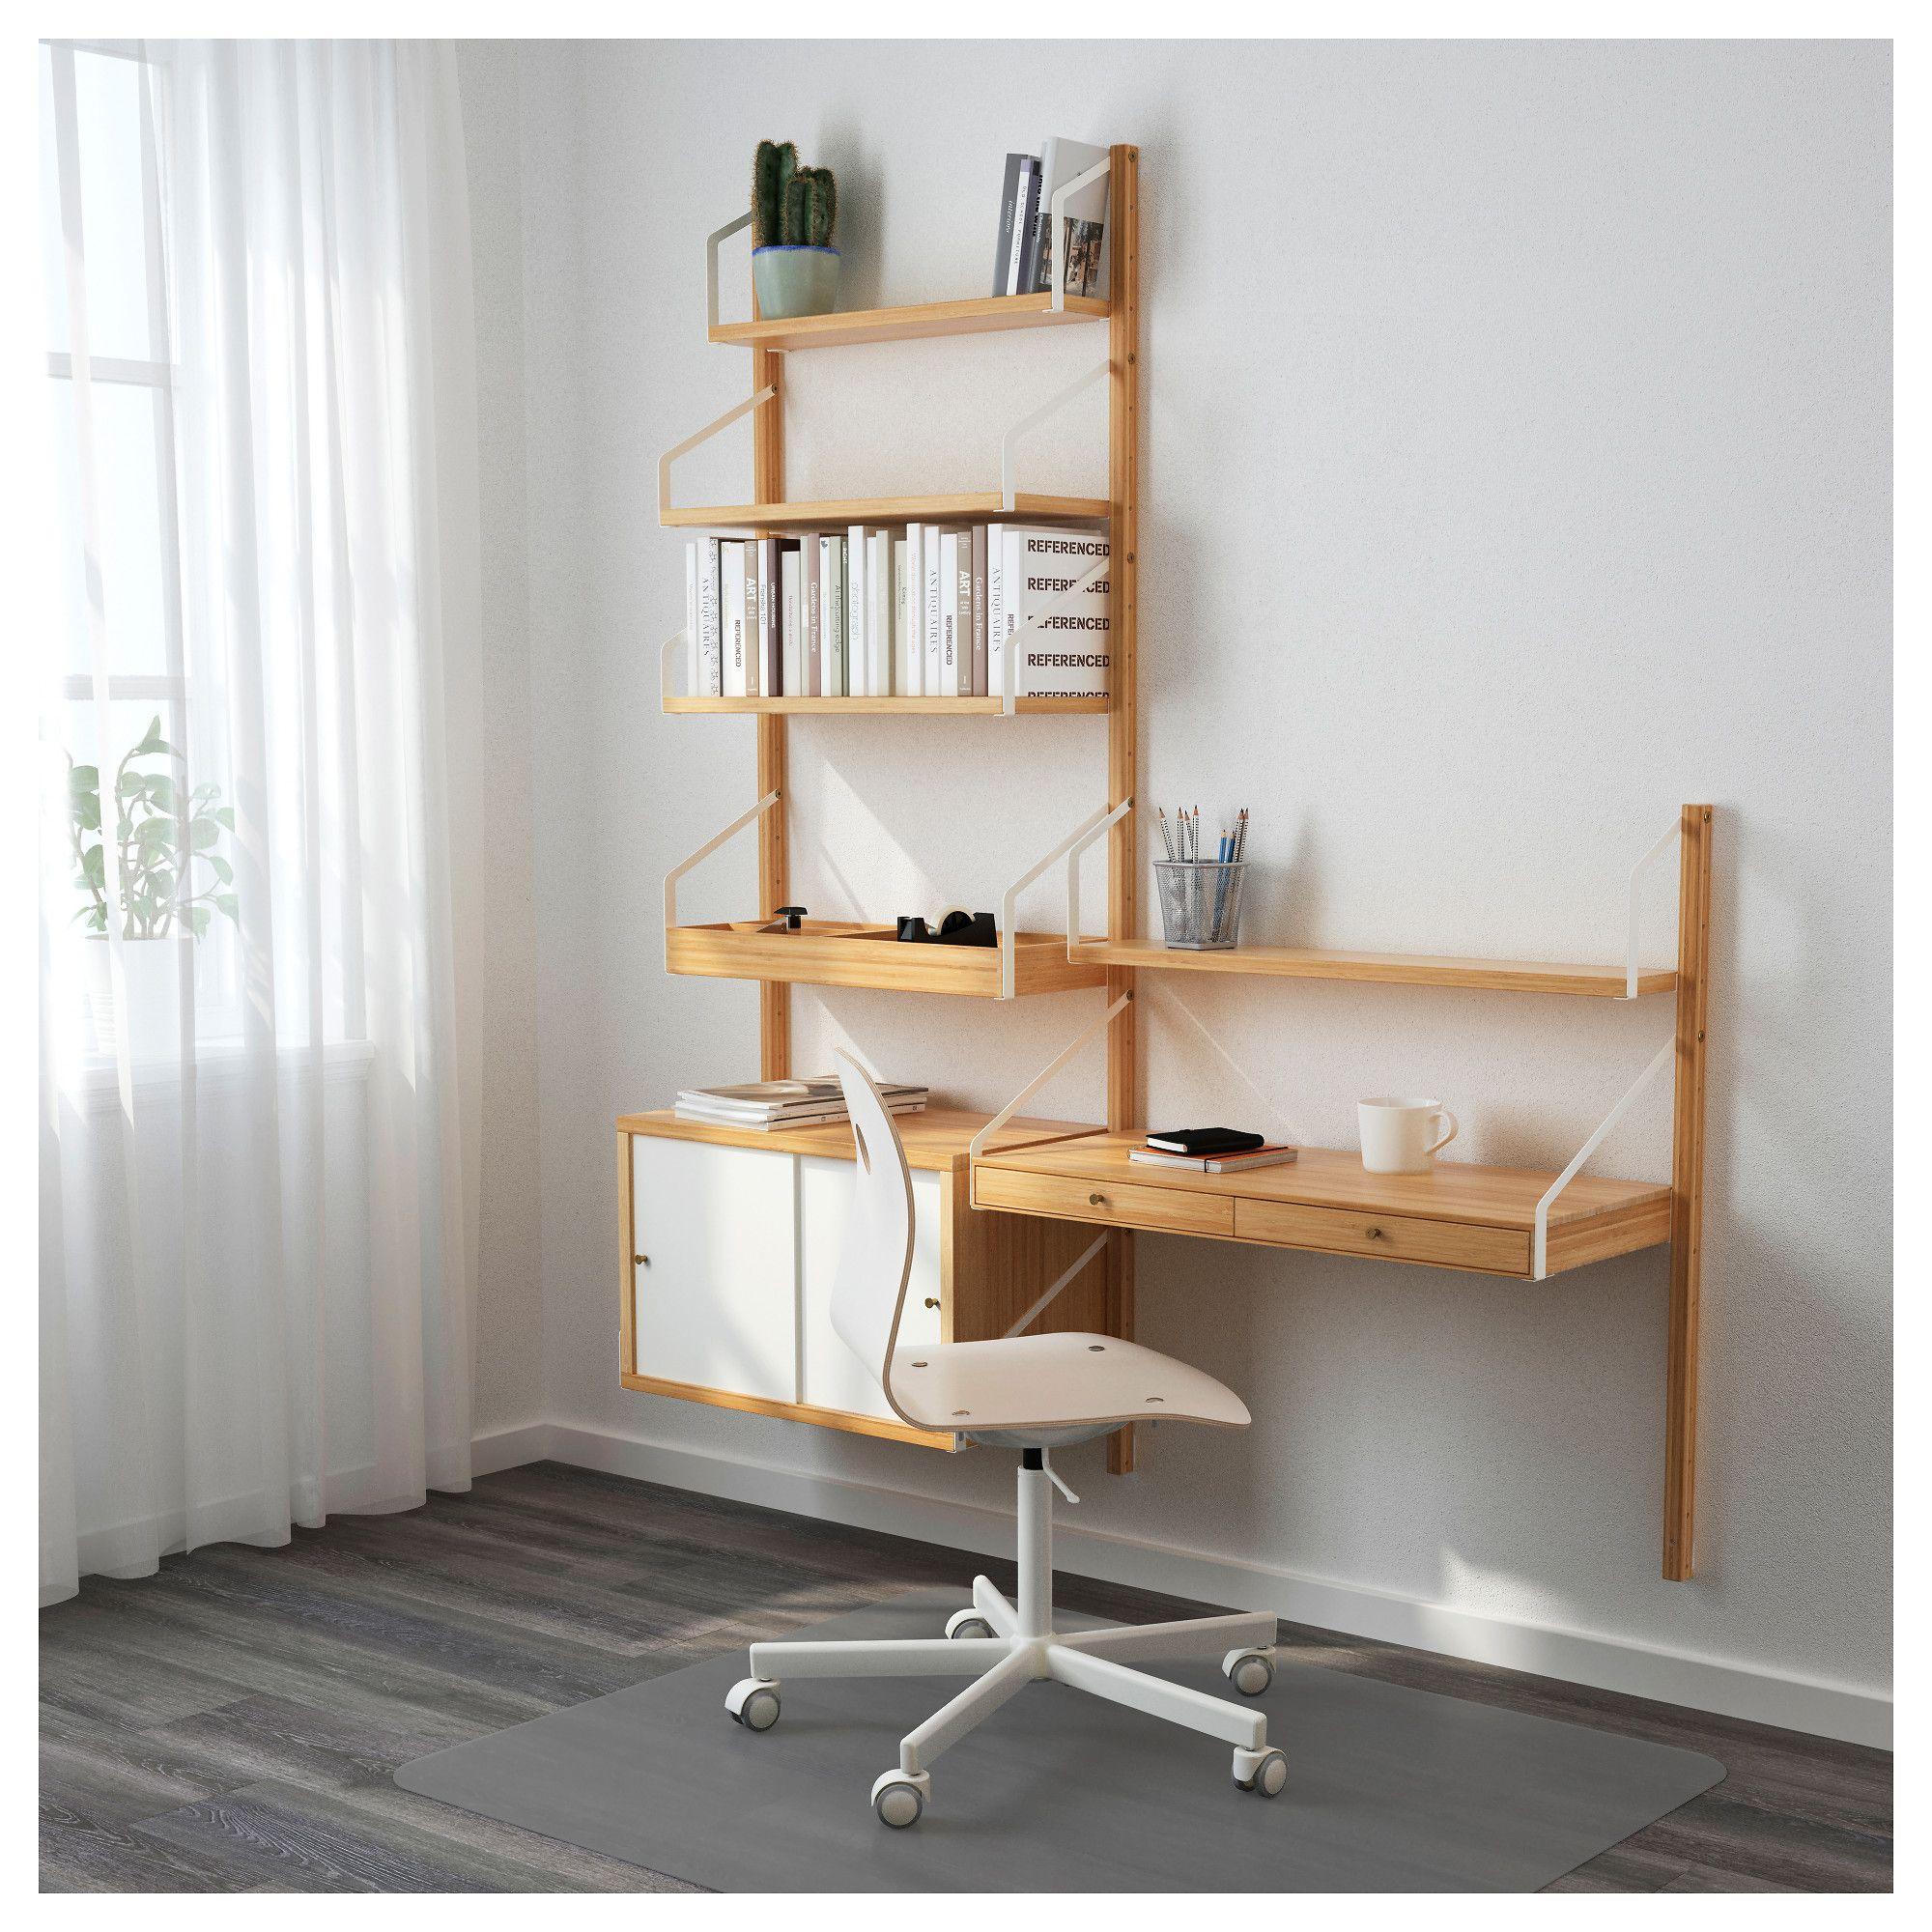 Us Furniture And Home Furnishings Floating Shelves Living Room